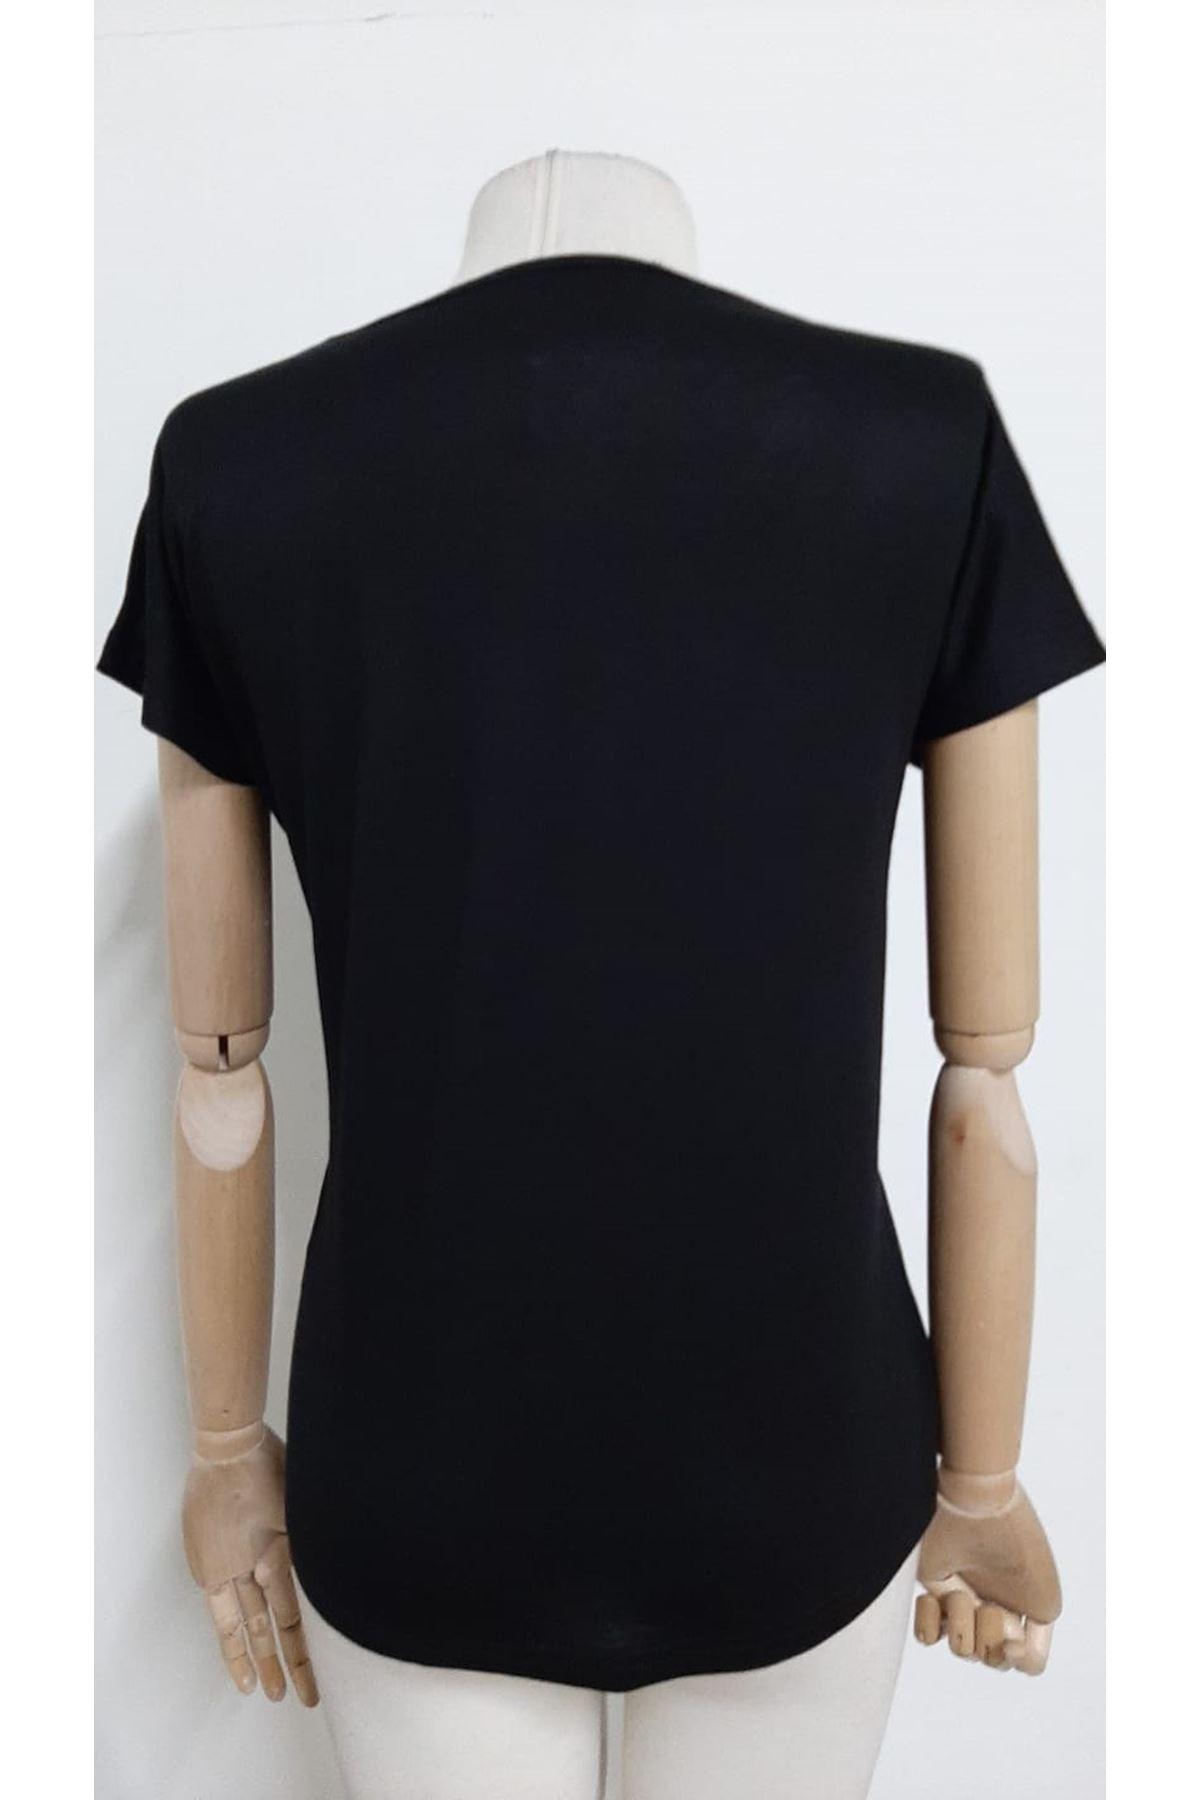 Yaka Dantelli Bluz - siyah